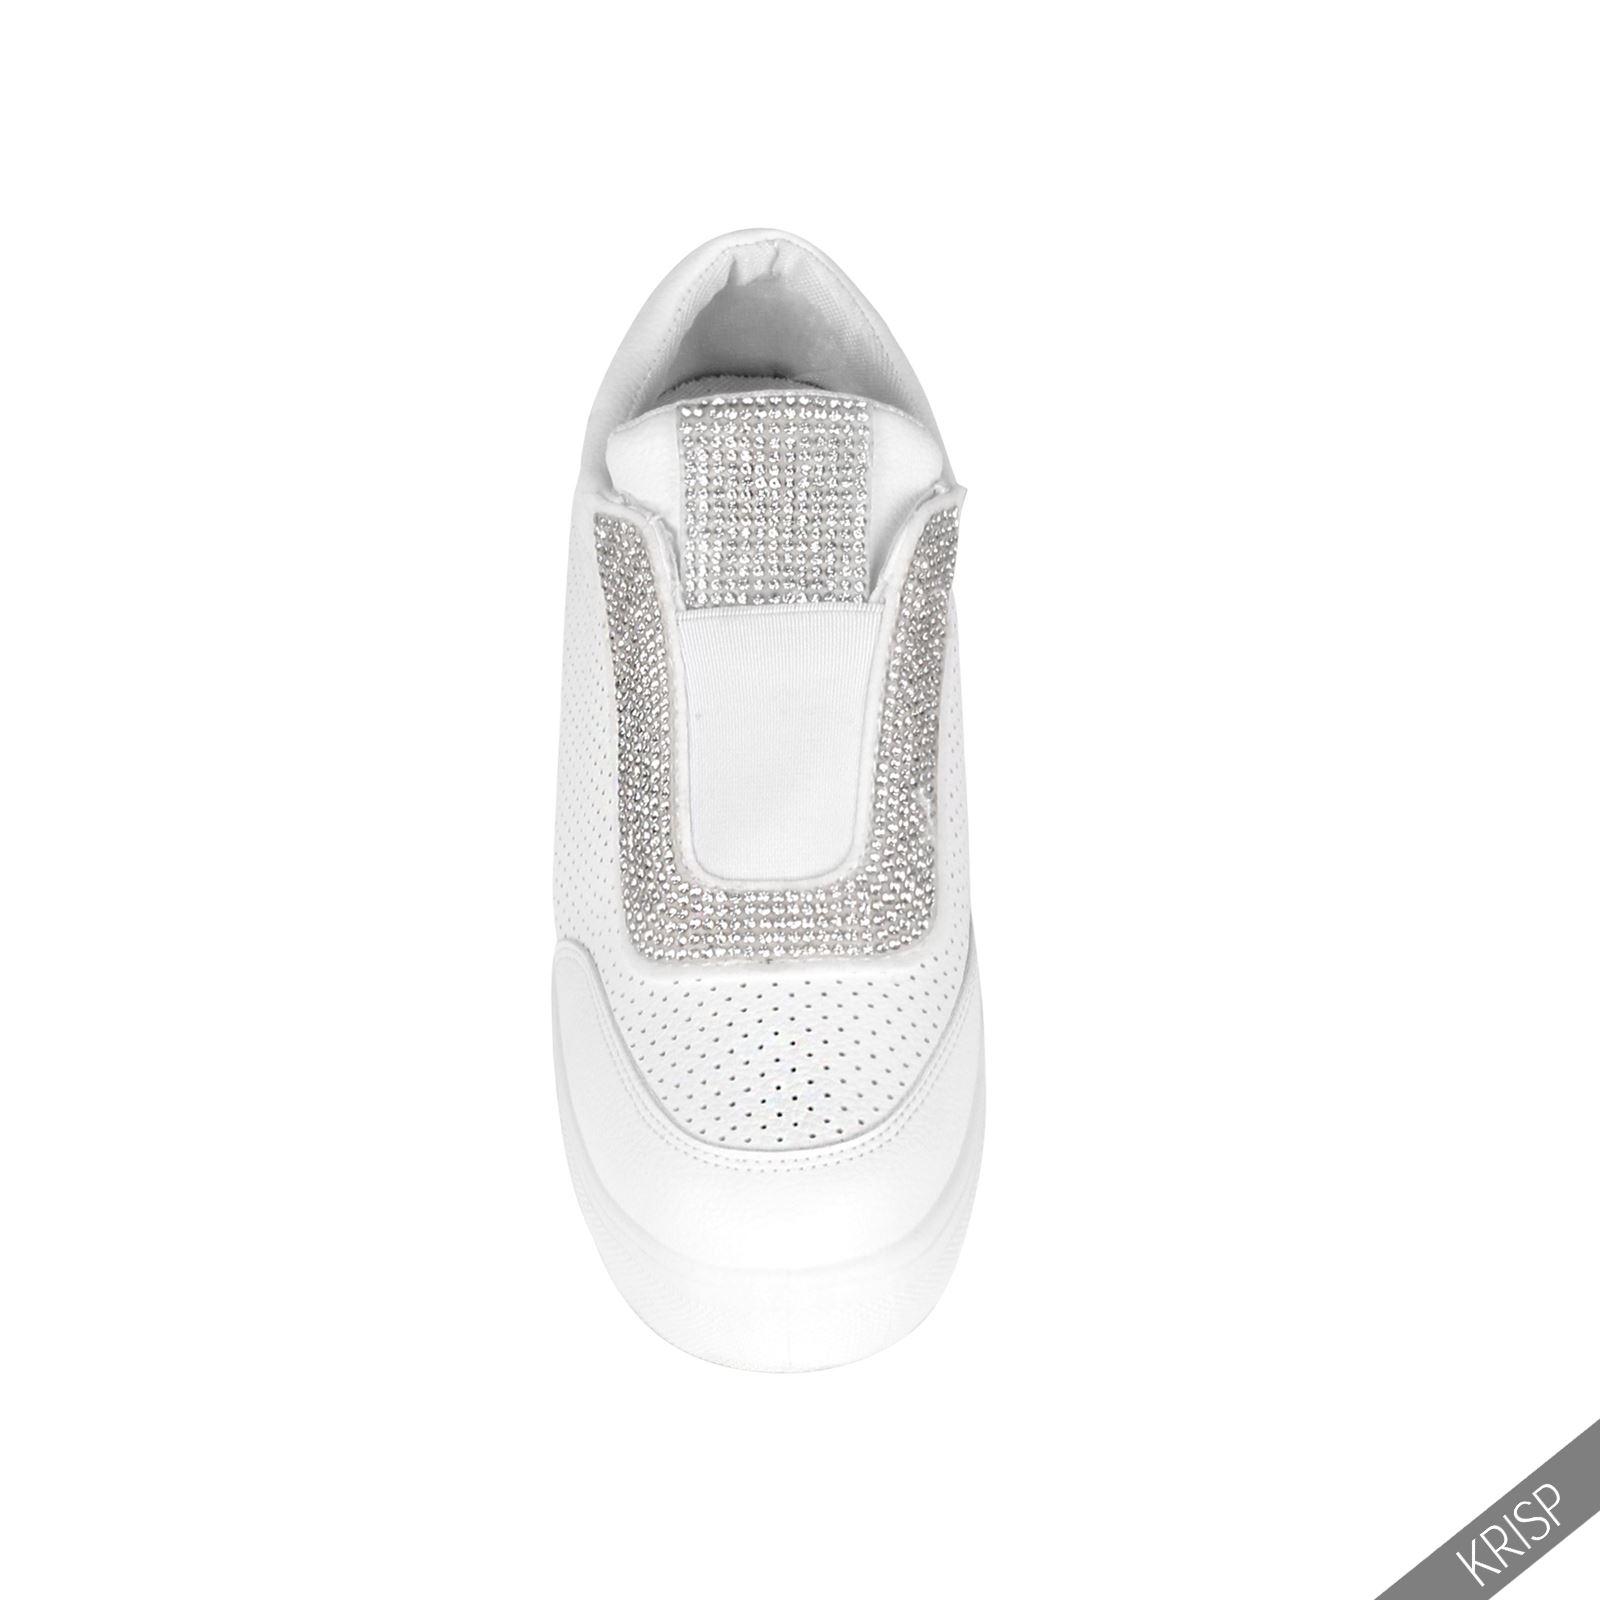 damen keilabsatz slip on sneaker mit absatz schuhe sommer wedge high heels. Black Bedroom Furniture Sets. Home Design Ideas